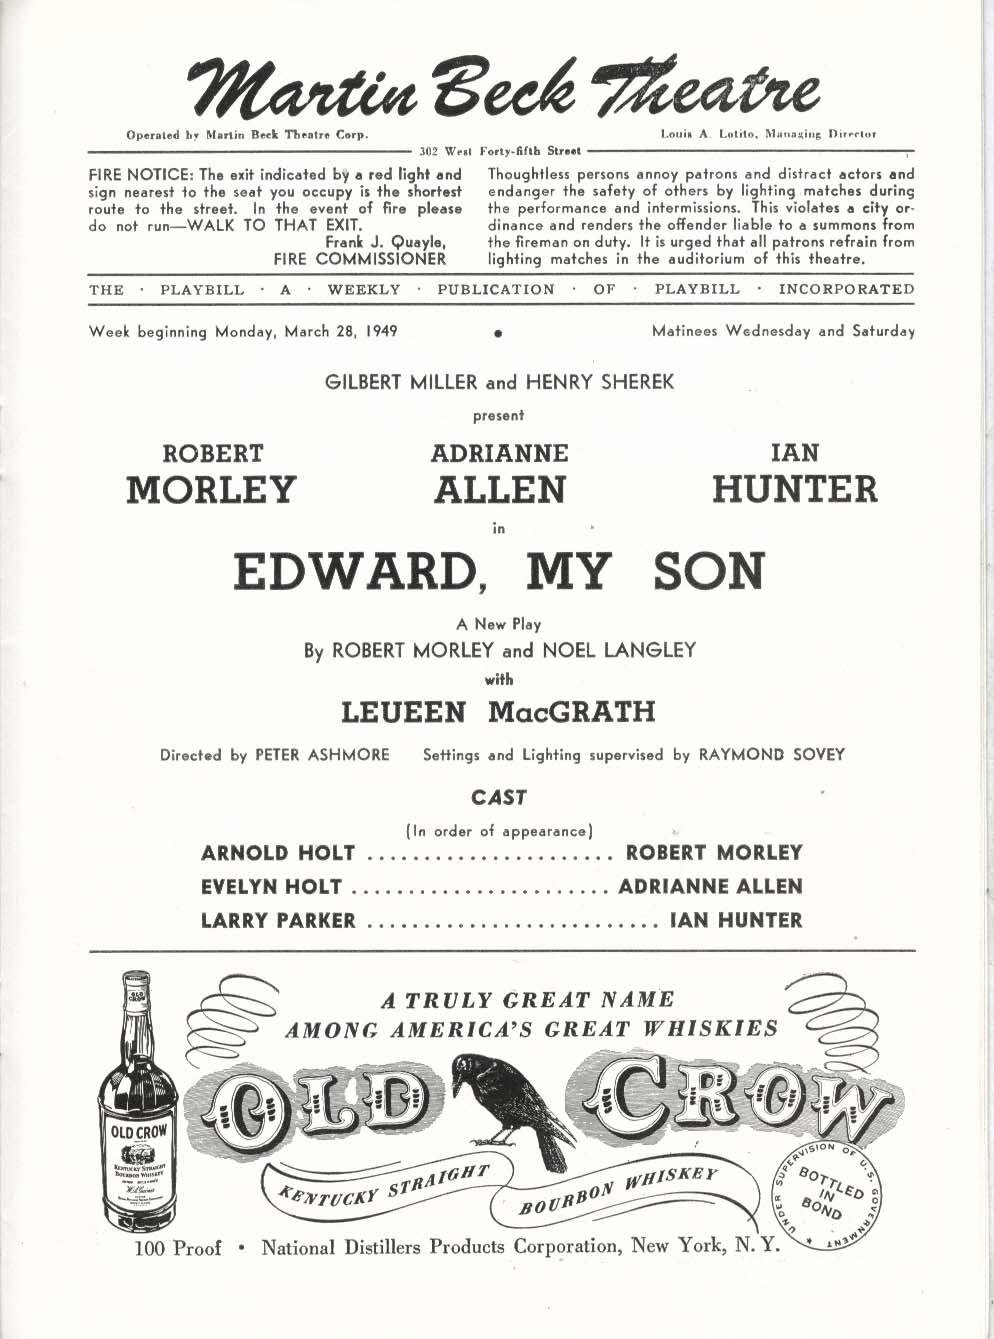 Image for Edward, My Son Playbill 3/28/49 Robert Morley Adrianne Allen Ian Hunter